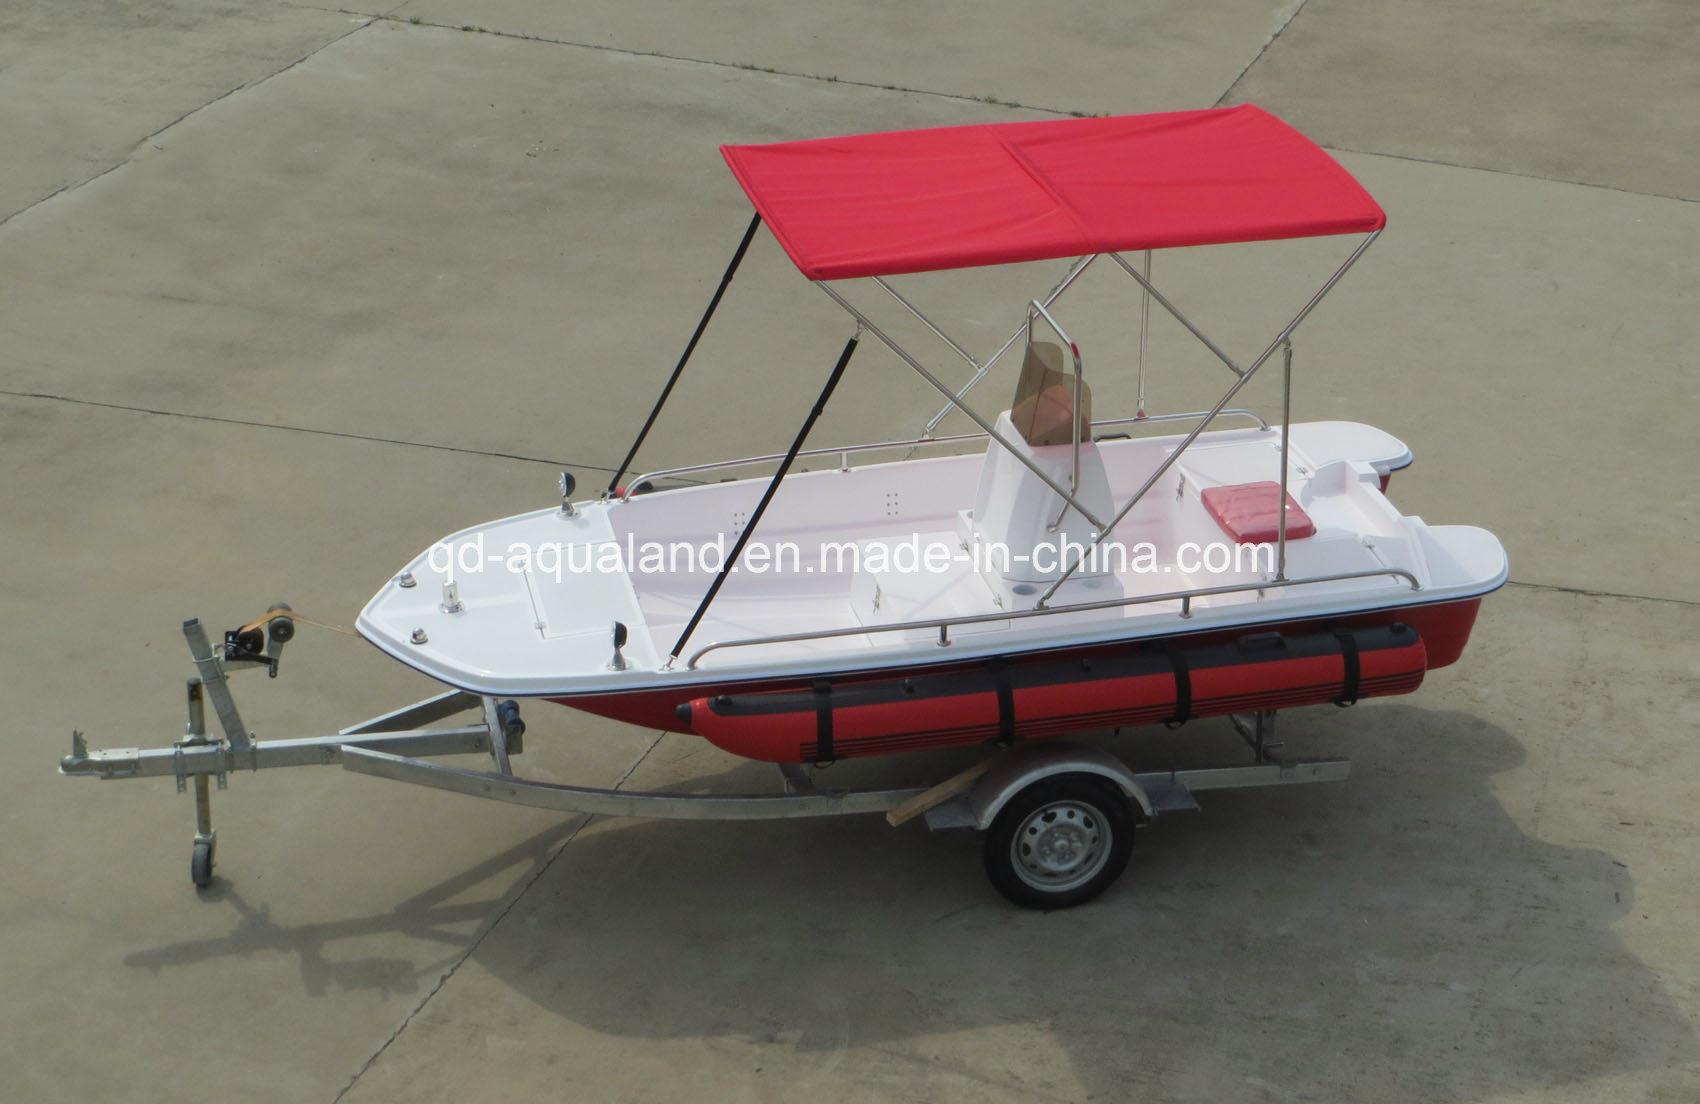 China aqualand 4m 13feet speed boat motor boat fiberglass for Fishing boat motor